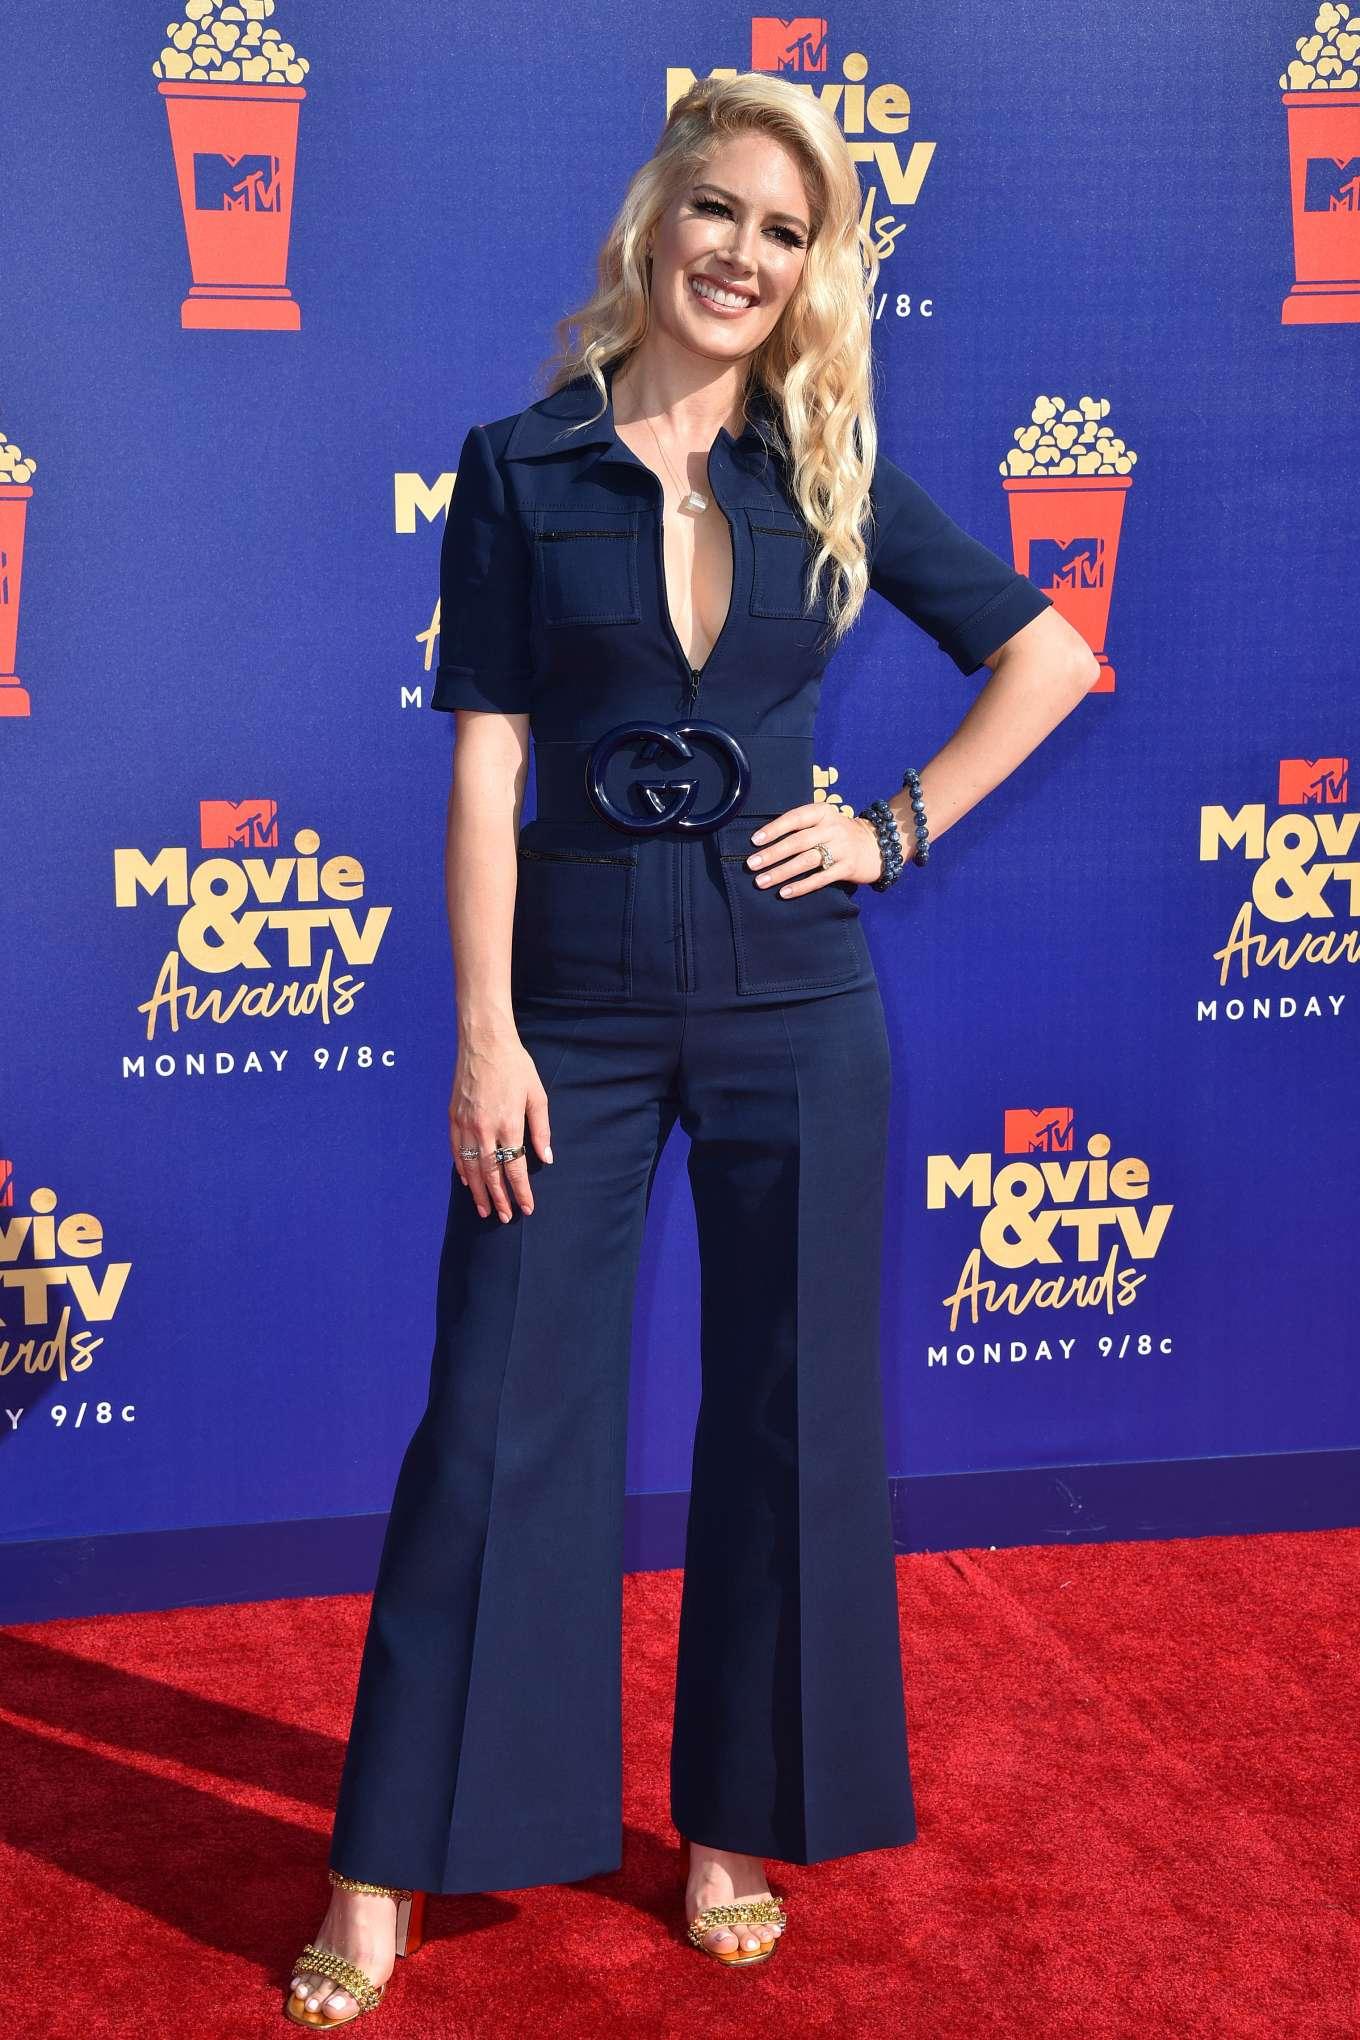 Heidi Montag 2019 : Heidi Montag: 2019 MTV Movie and TV Awards Red Carpet-06